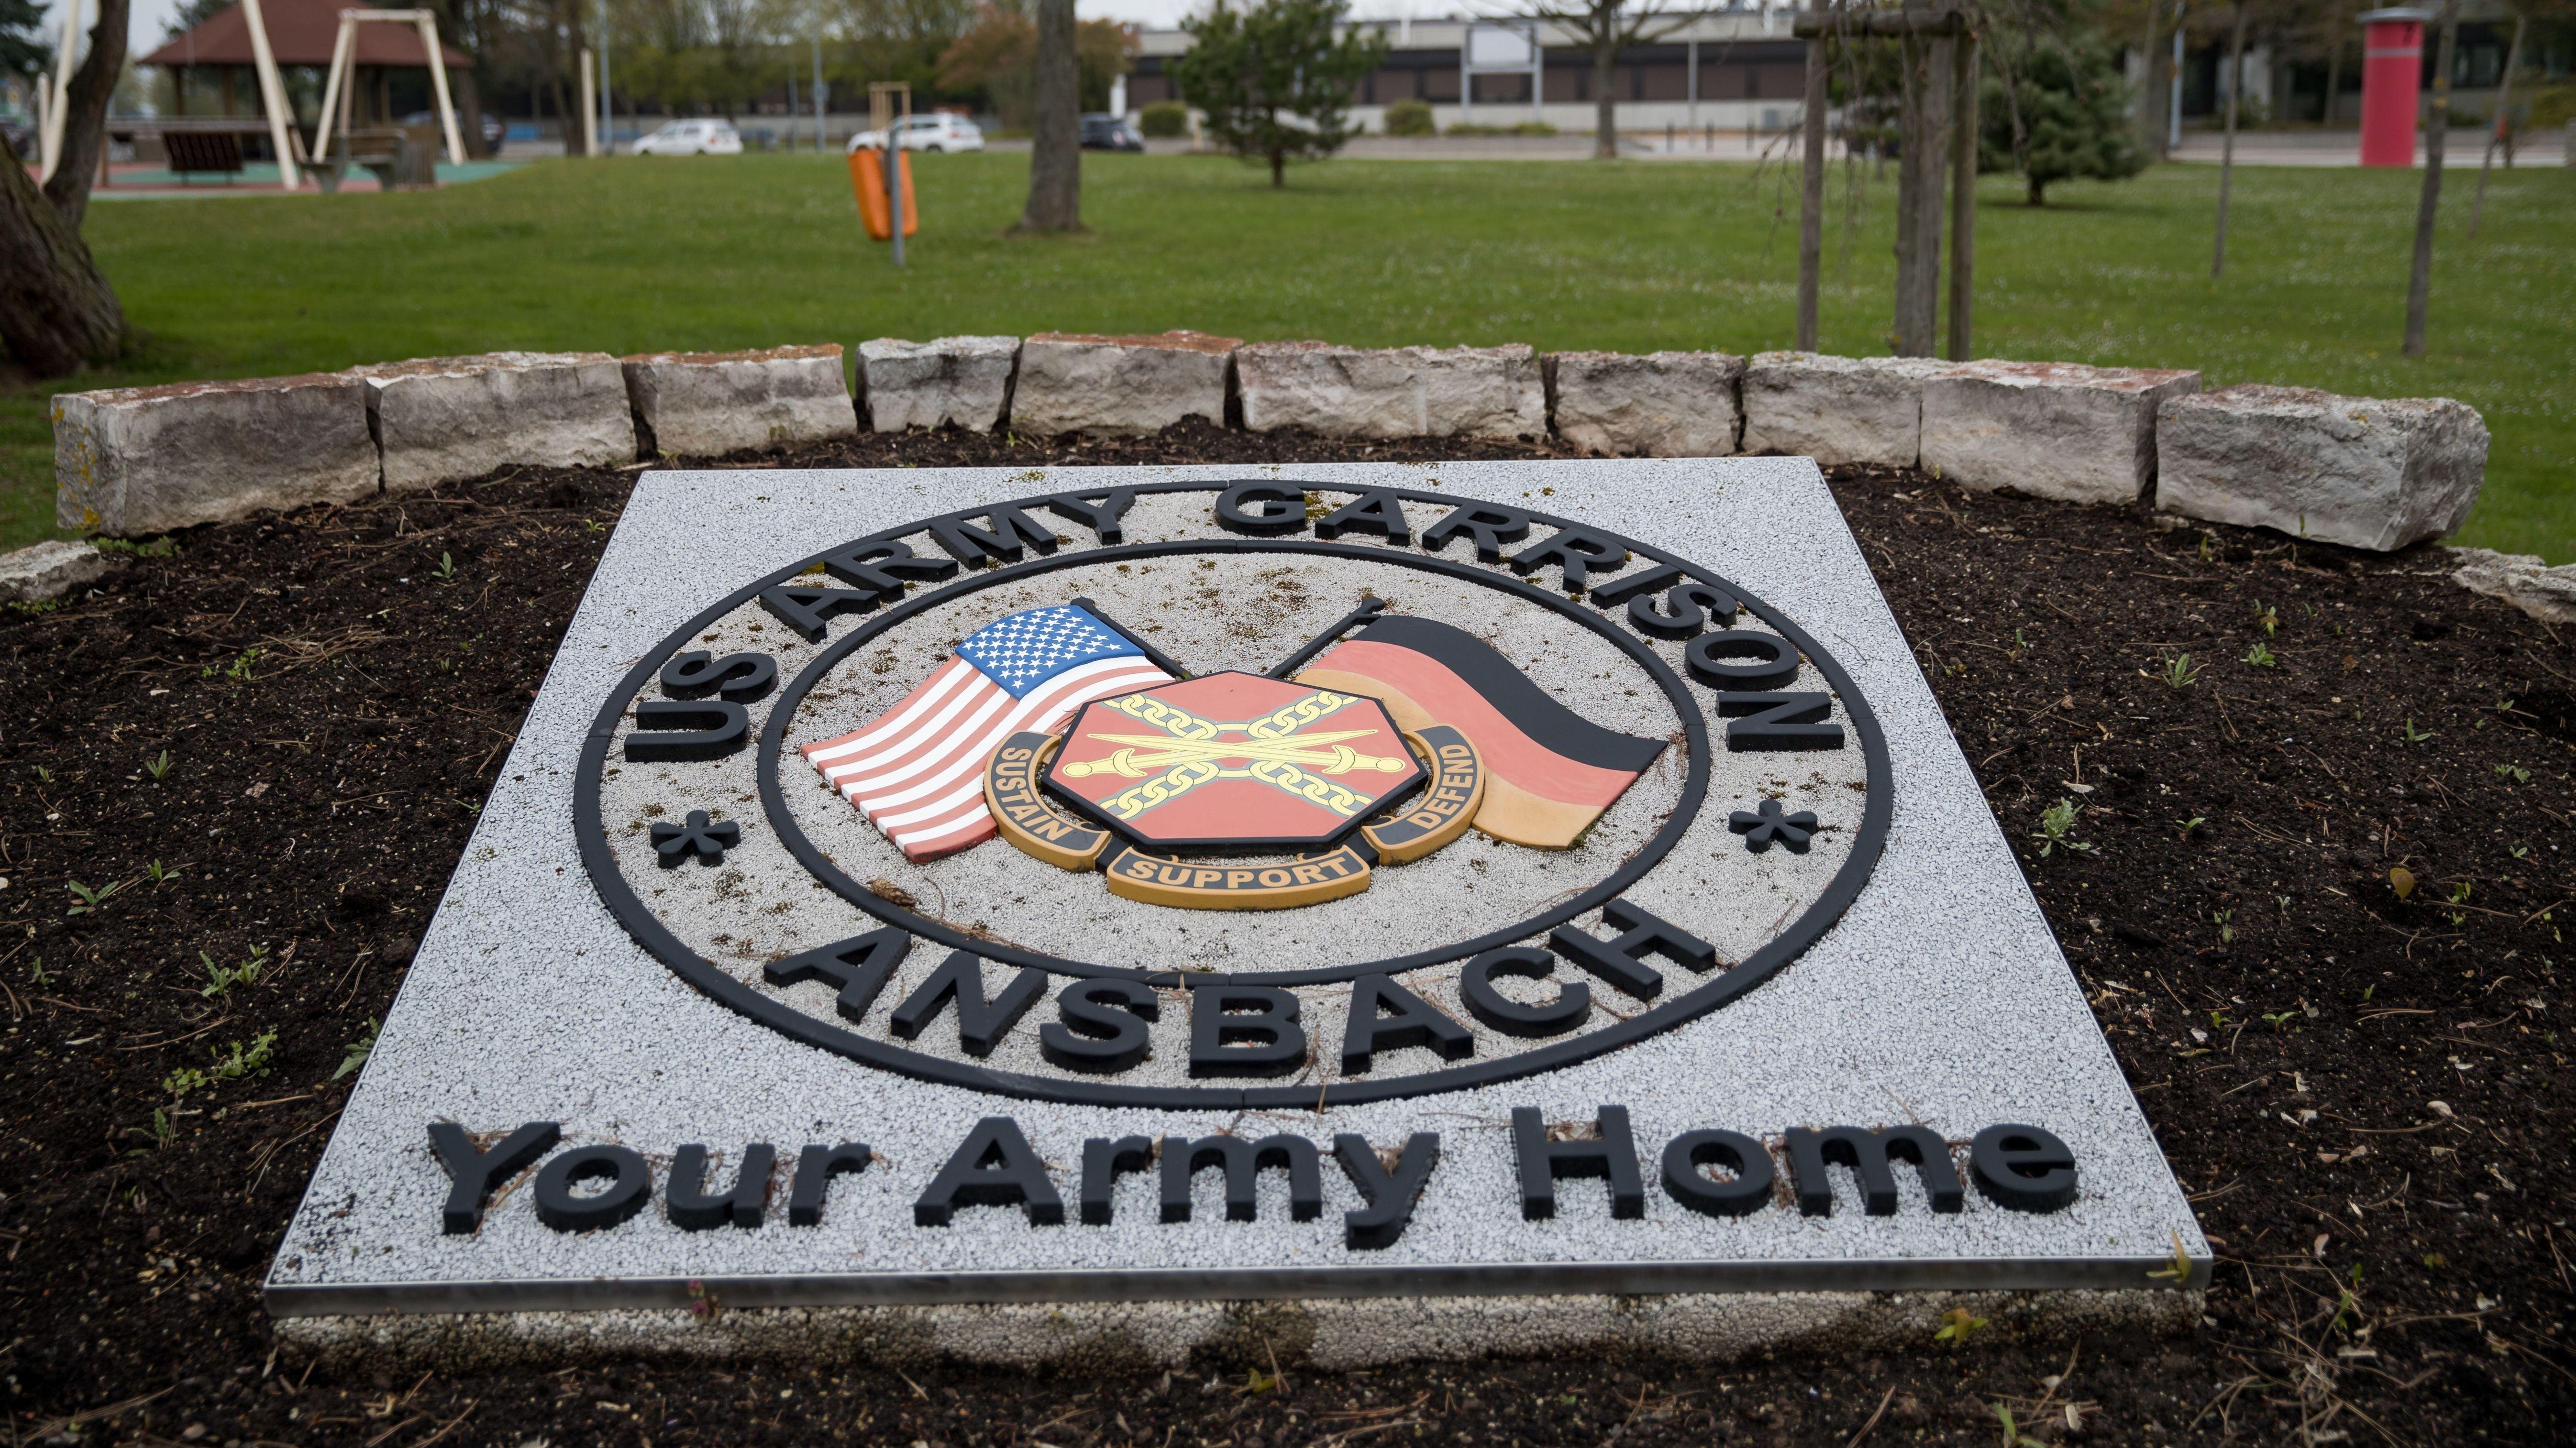 US-Armee-Stützpunkt in Ansbach-Katterbach